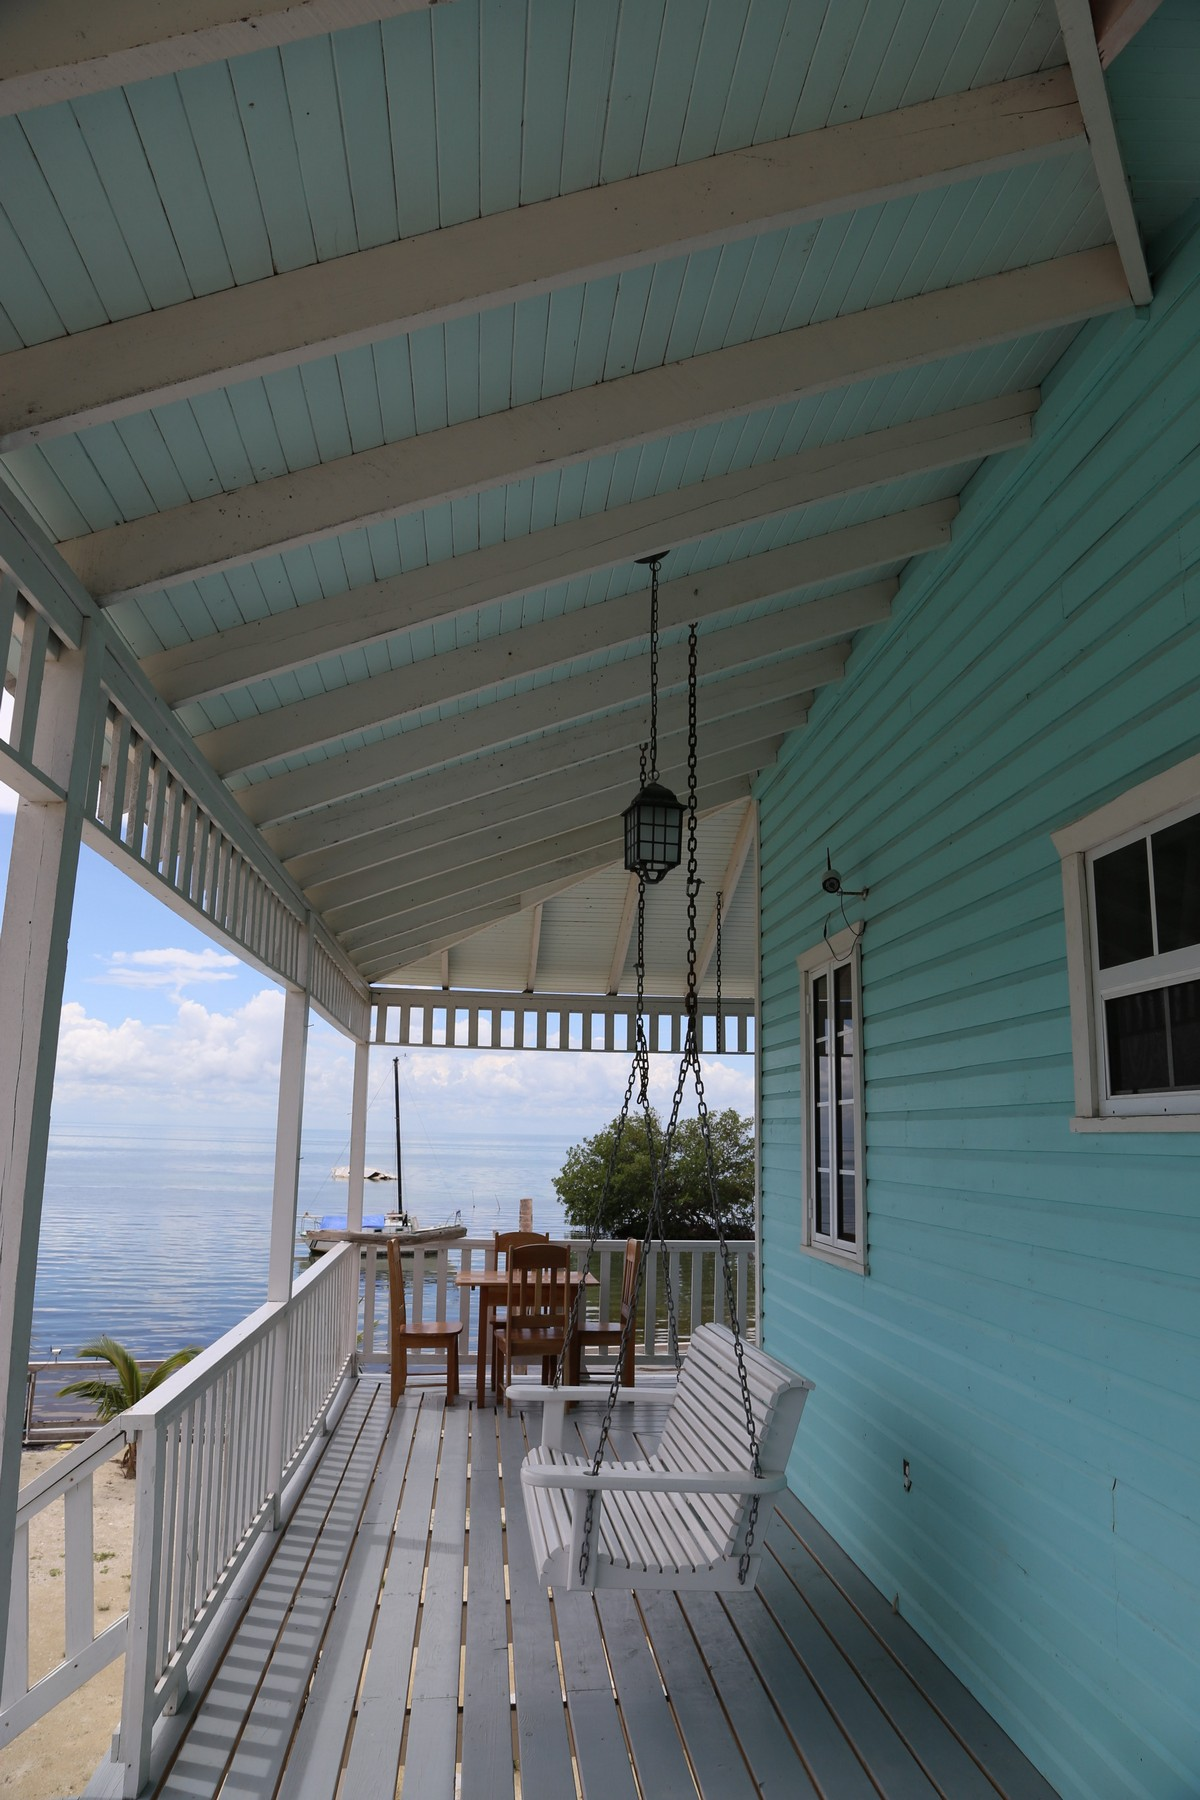 Casa multifamiliare per Vendita alle ore Caye Caulker Oceanfront Caye Caulker, Belize, Belize